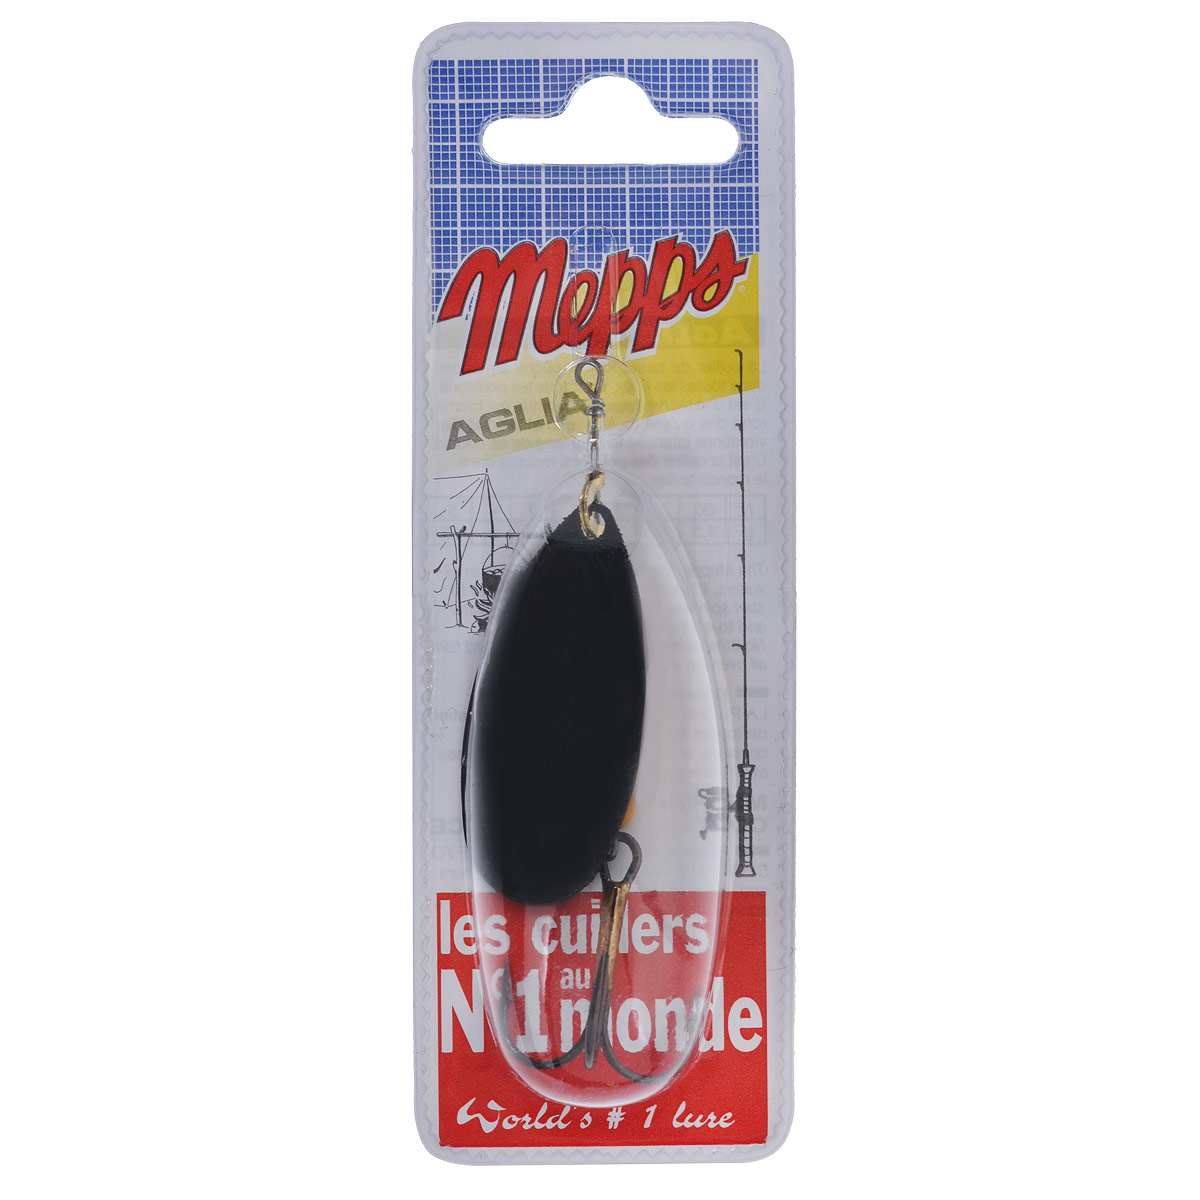 Блесна Mepps Aglia NR, вращающаяся, №5, 13 г mepps блесна вращ mepps aglia longue heavy cu nr oge блистер 3 24г lhe300fo31